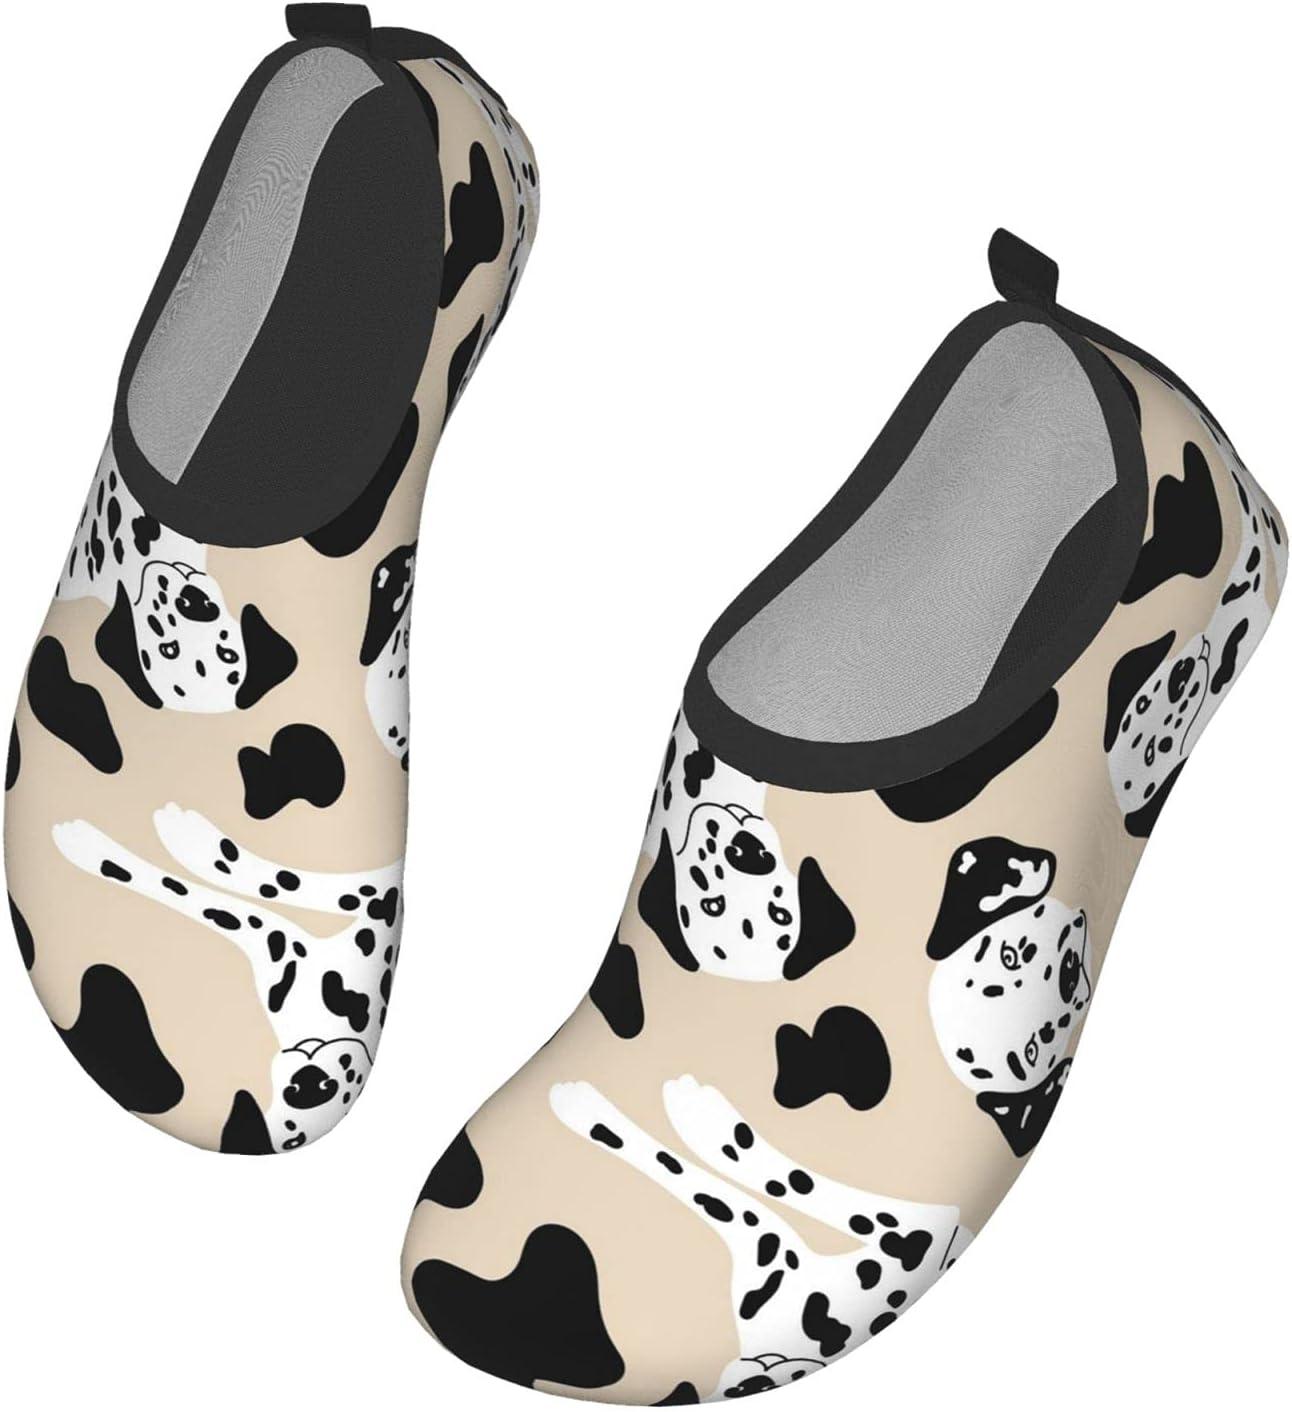 NA Cute Dalmatian Pattern Men's Women's Water Shoes Barefoot Quick Dry Slip-On Aqua Socks for Yoga Beach Sports Swim Surf